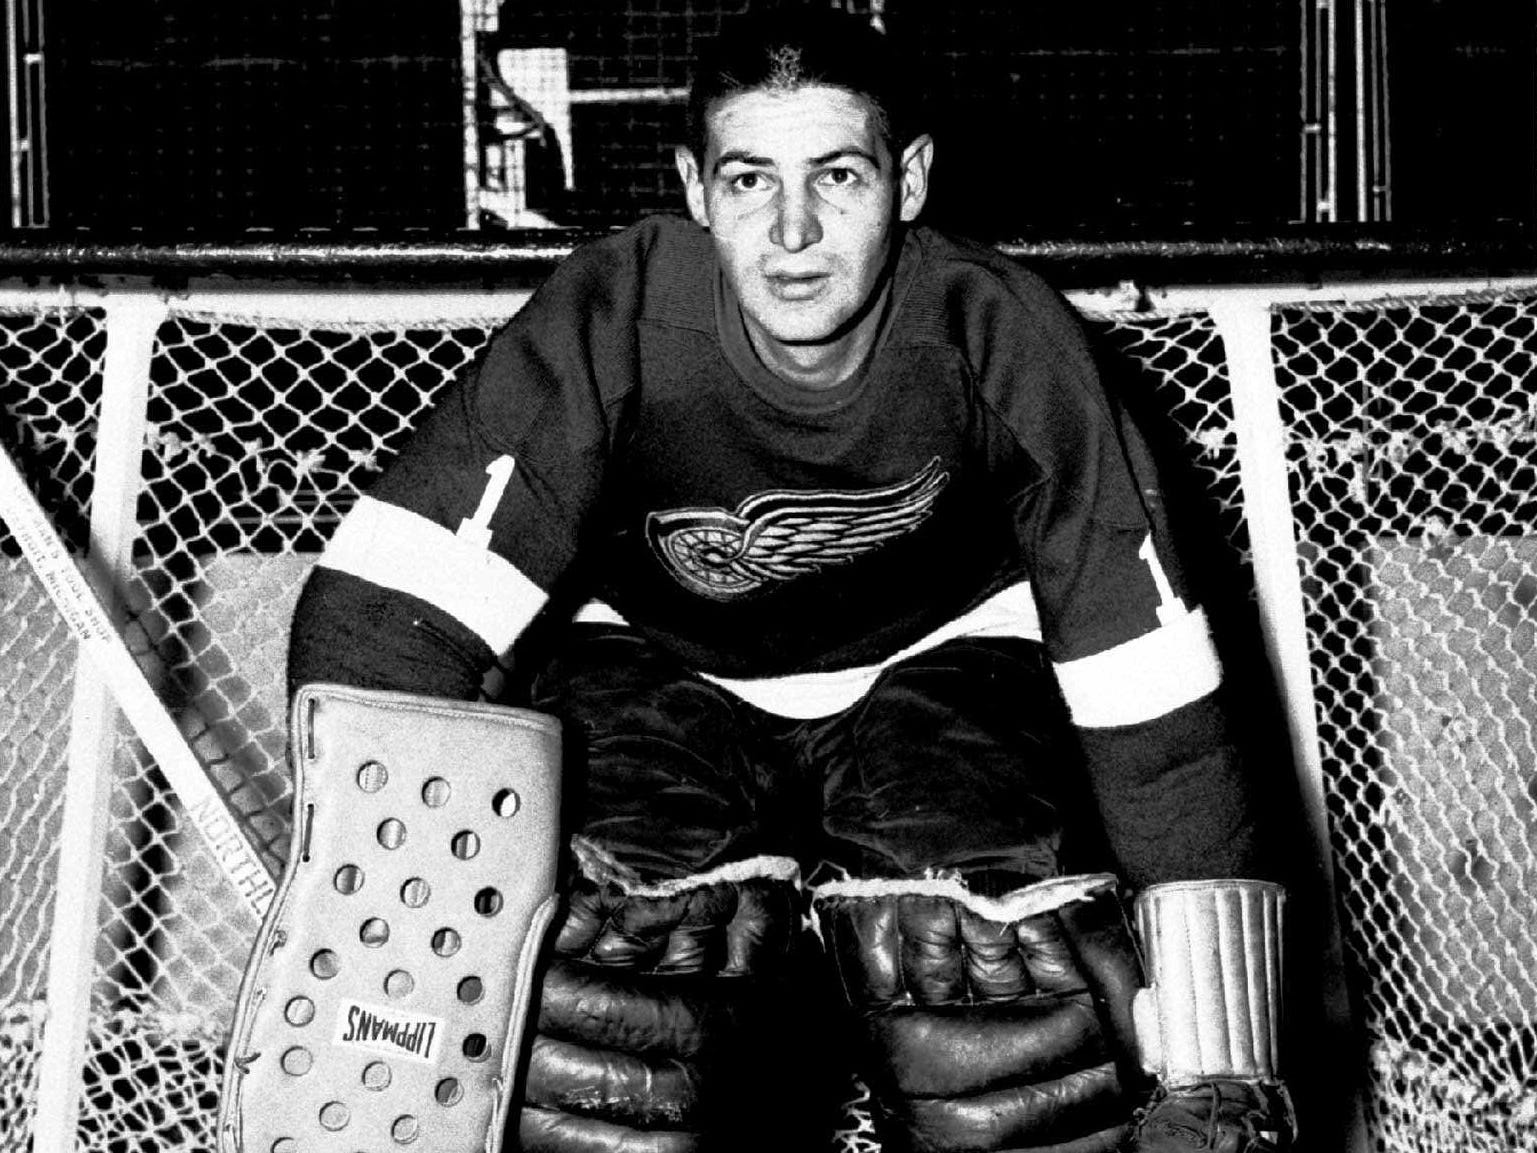 1. Terry Sawchuk (1951-64)